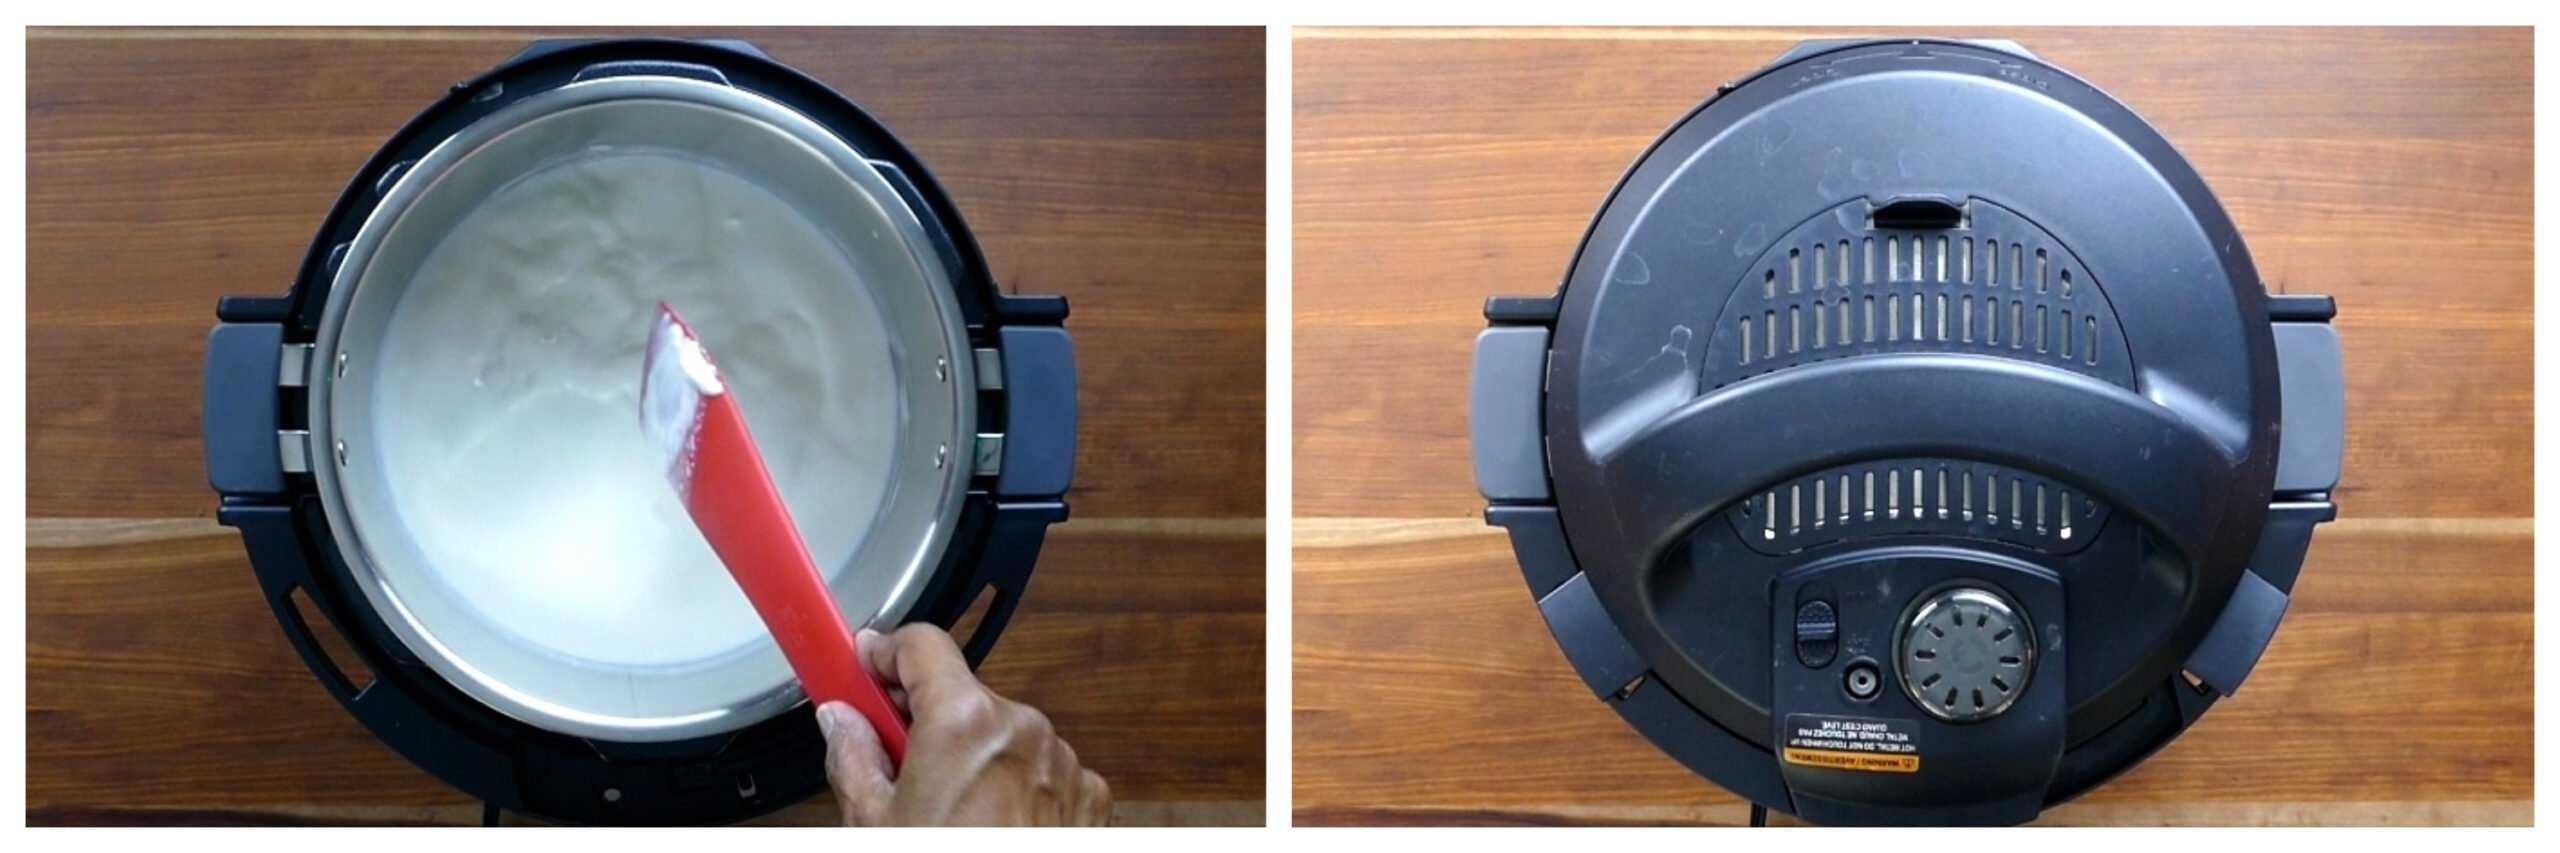 Instant Pot Cold Start Yogurt Instructions collage - stir in yogurt, close lid